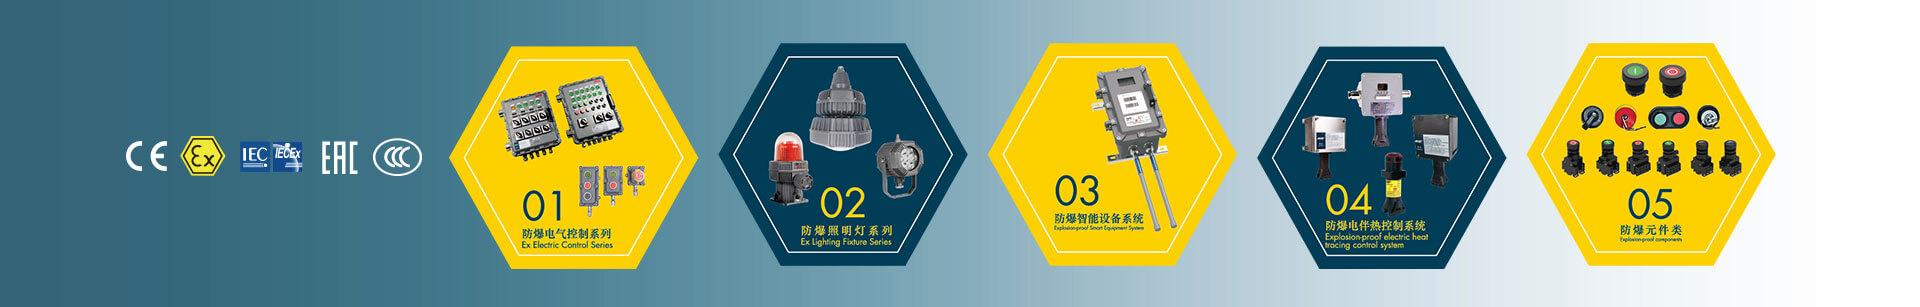 MAM Explosion-proof Technology (Shanghai)Co., Ltd.